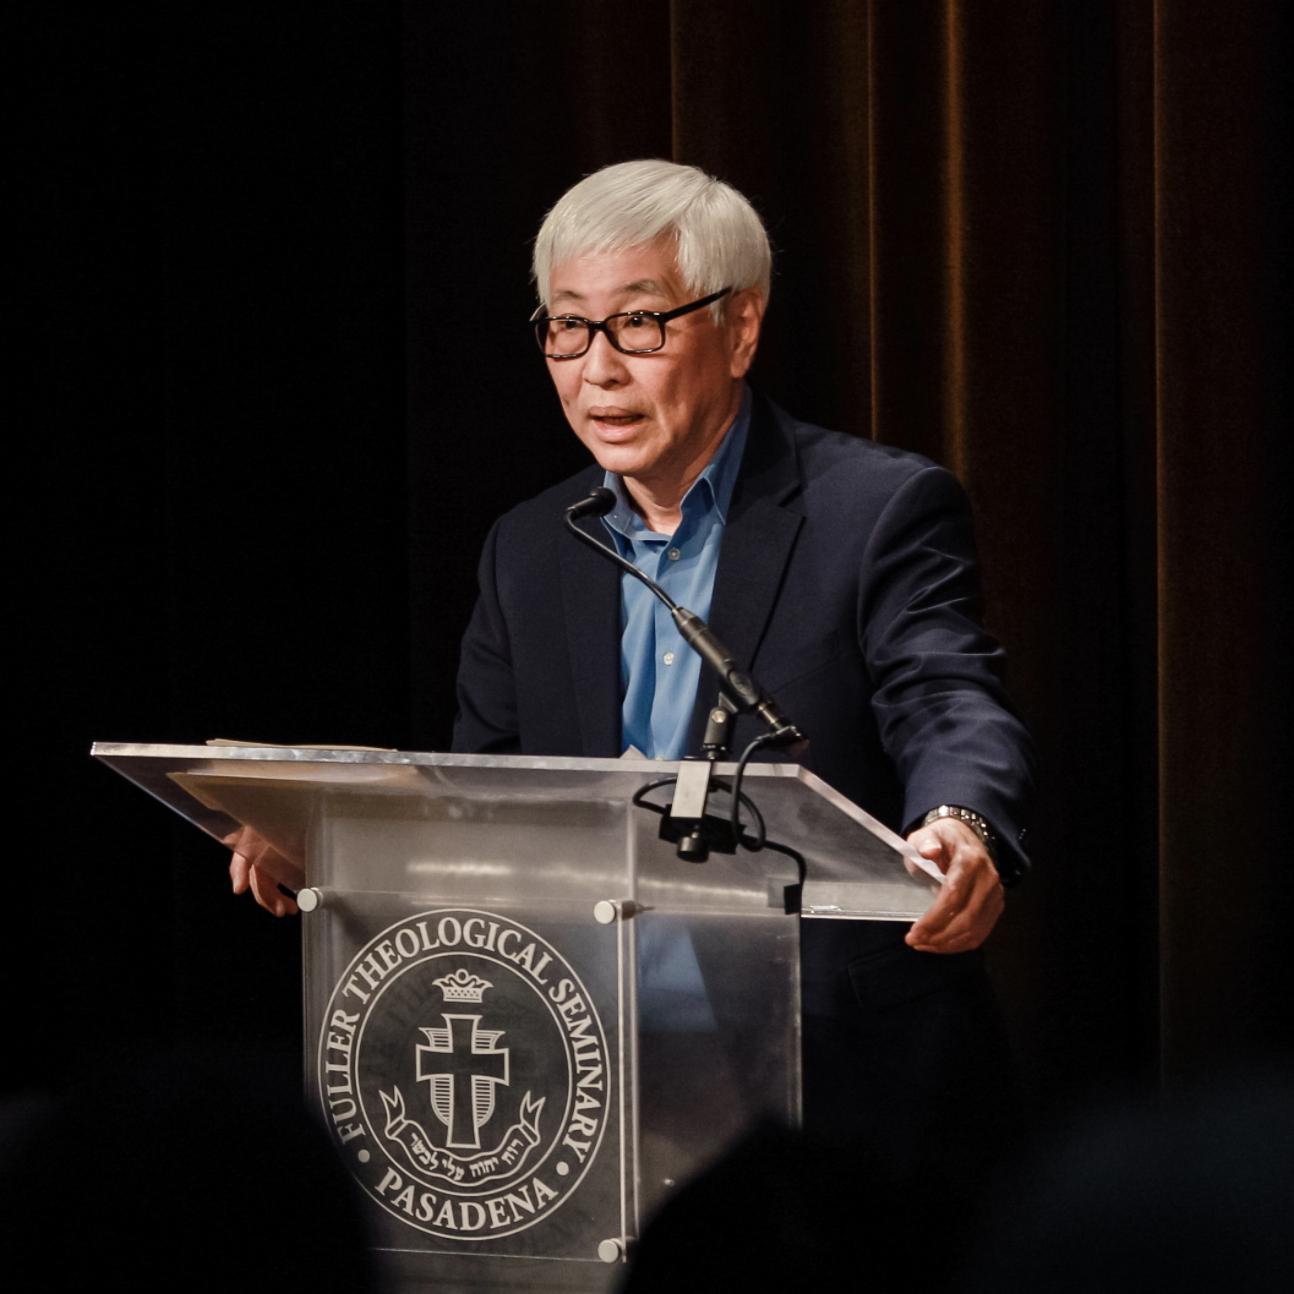 Senior Professor of Psychology Siang-Yang Tan